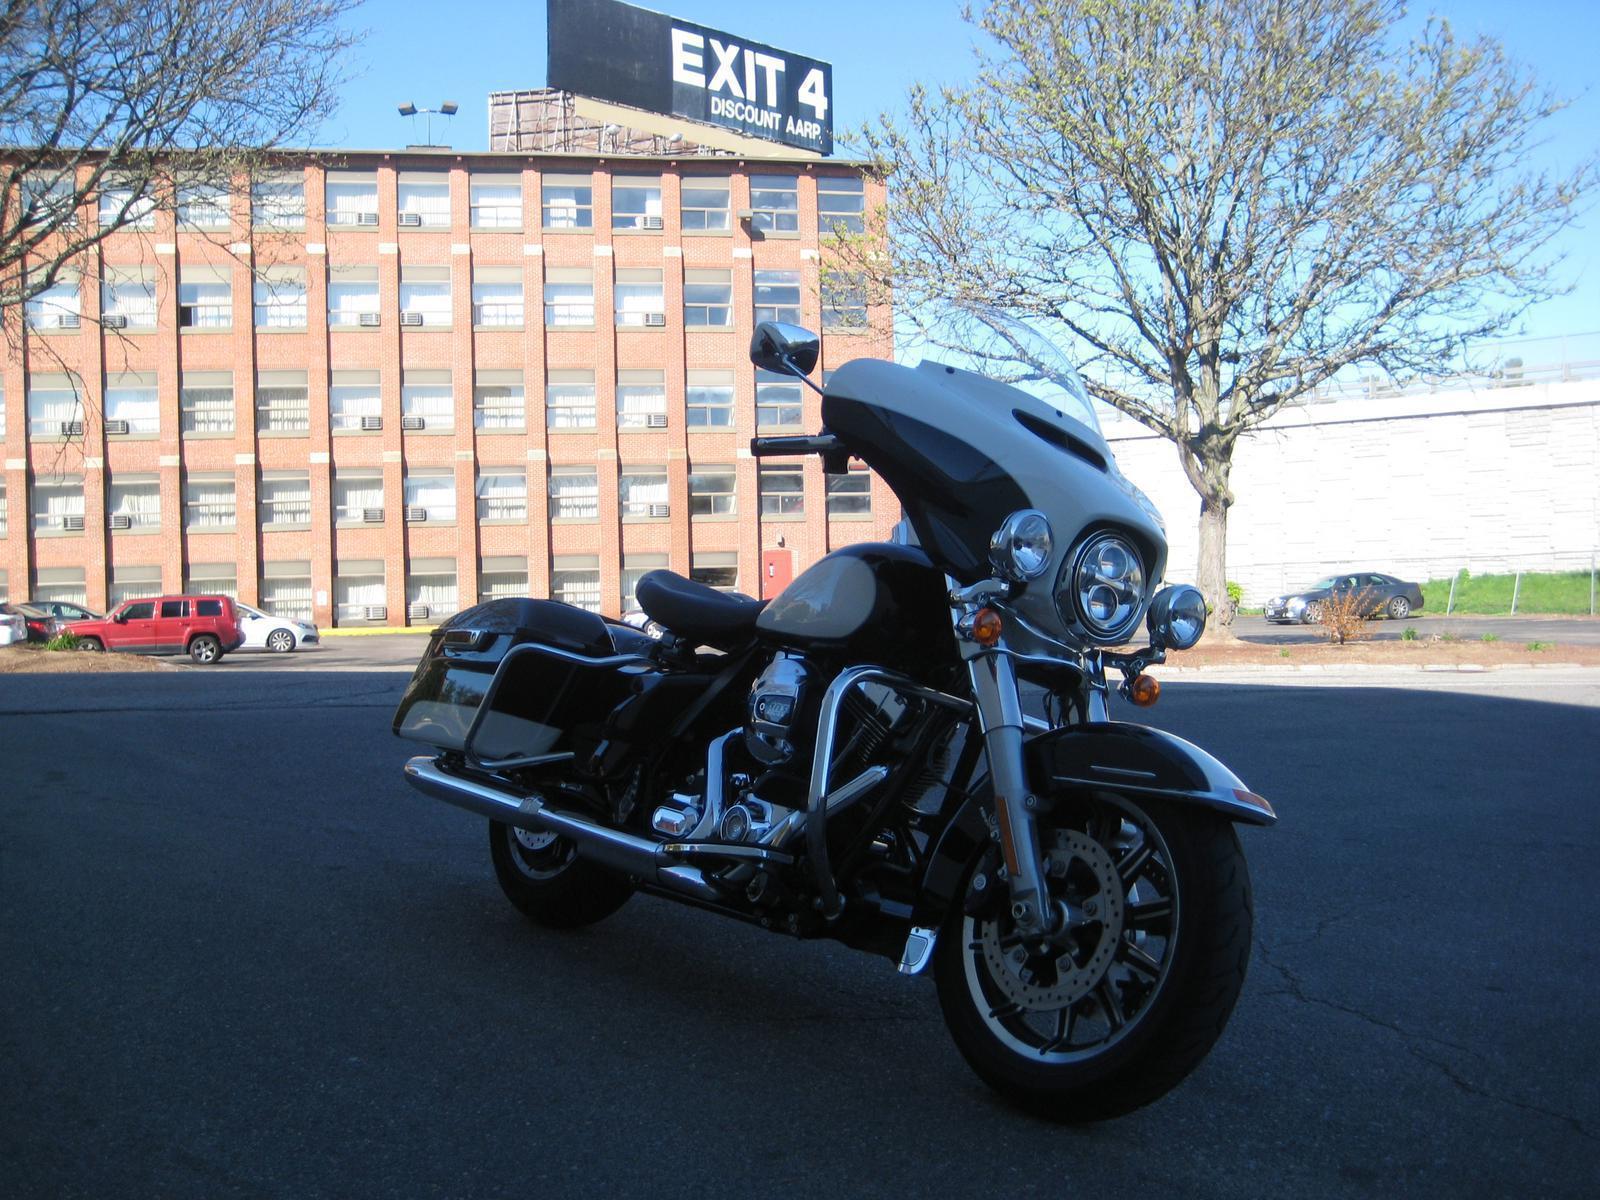 2015 Harley-Davidson® Electra Glide Police FLHTP